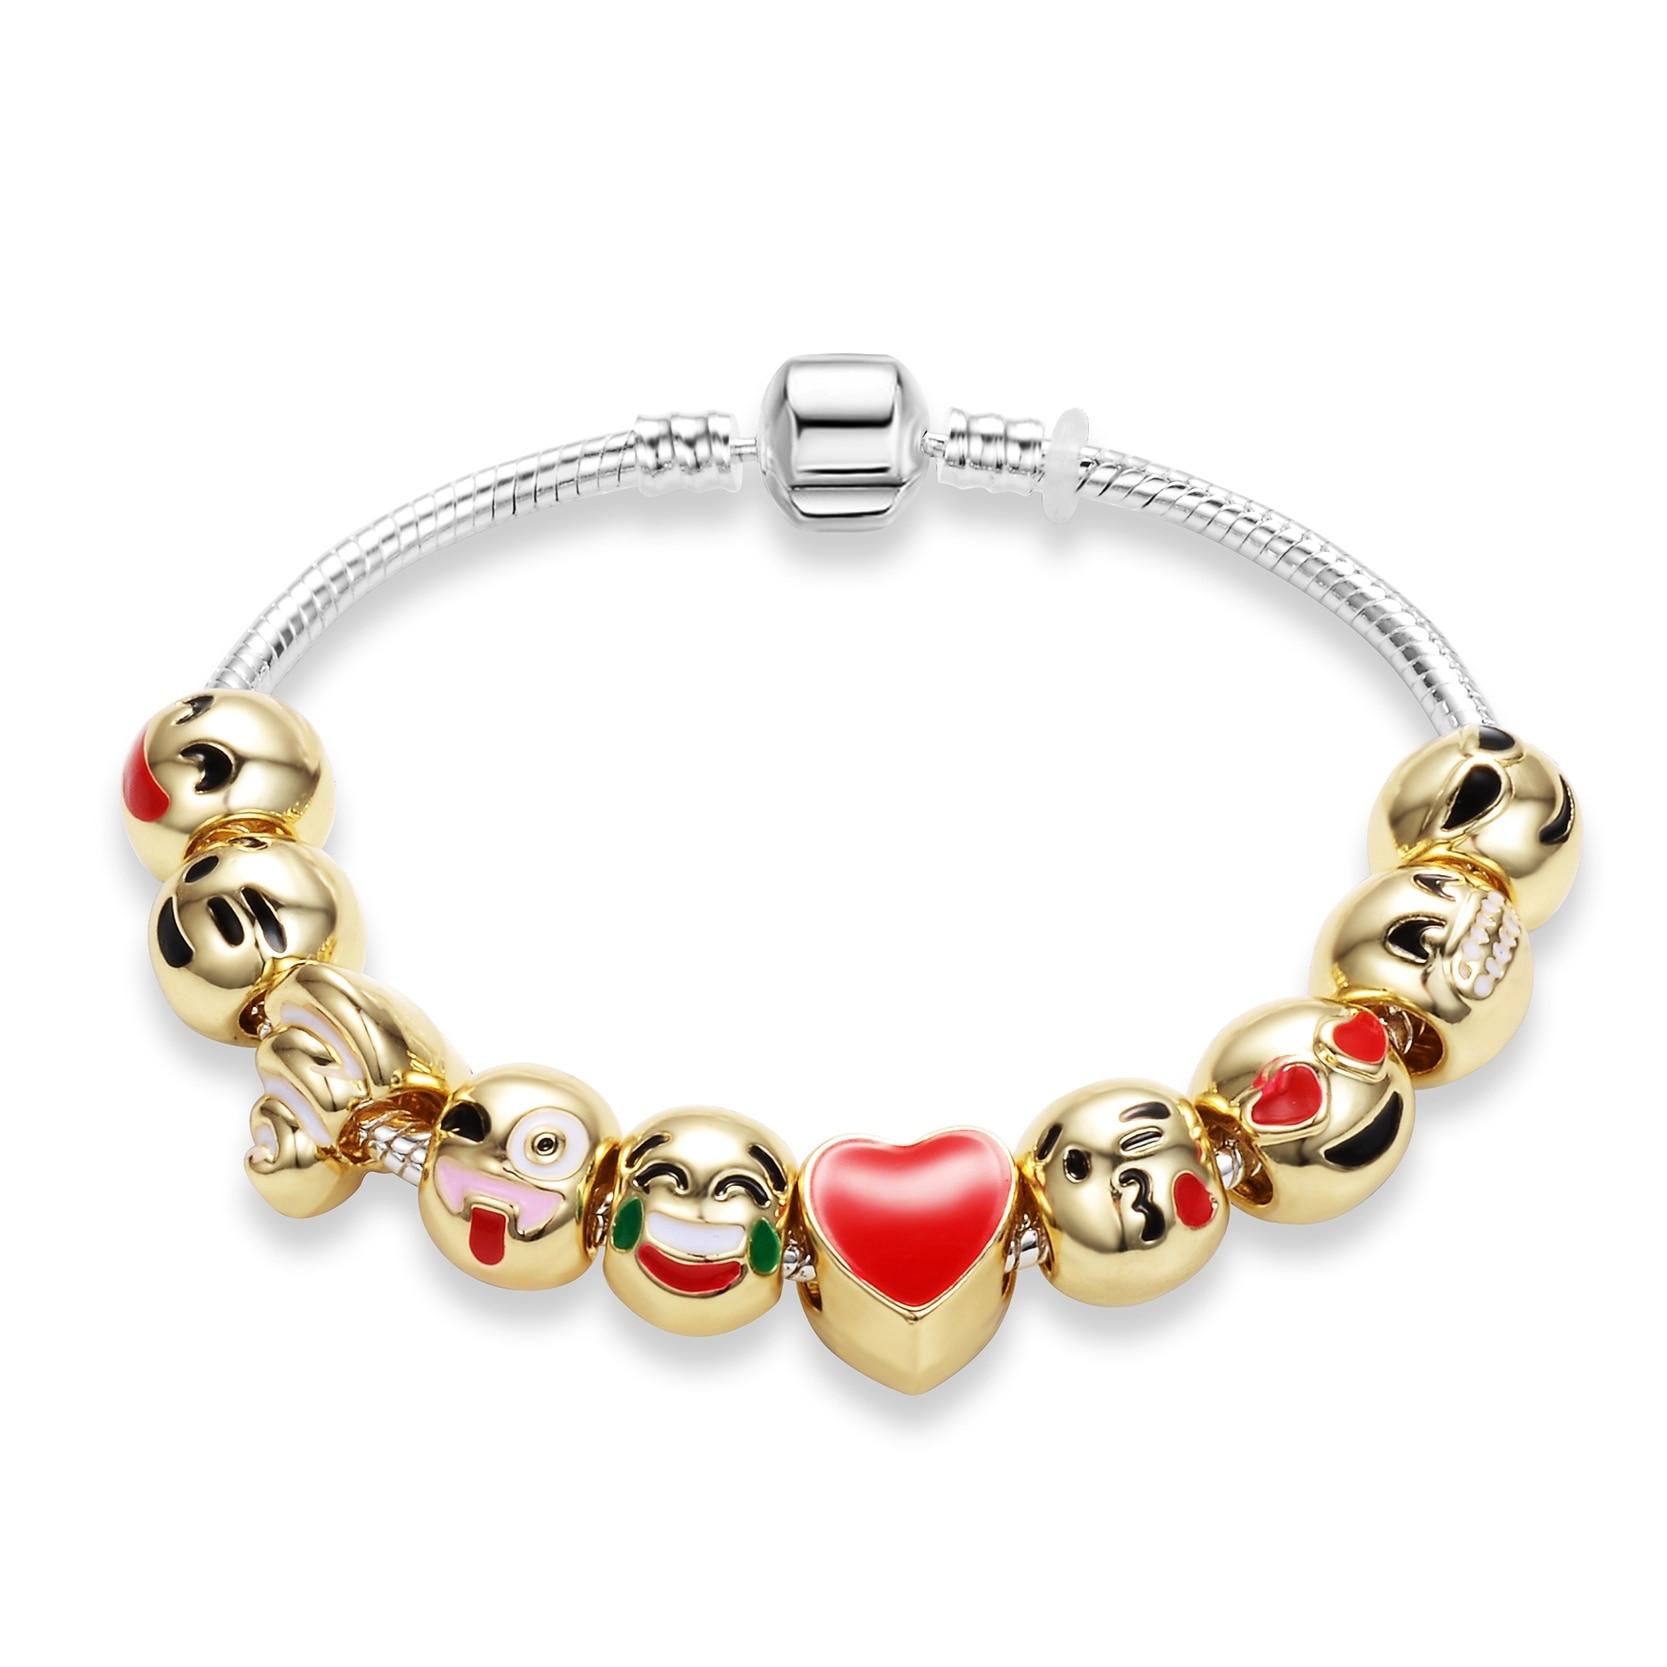 Fashion Diy Emoji Charm Bracelet Love Heart Animal Sterling Silver Jewelry  Golden Color Beads Snake Chain Bracelet For Women